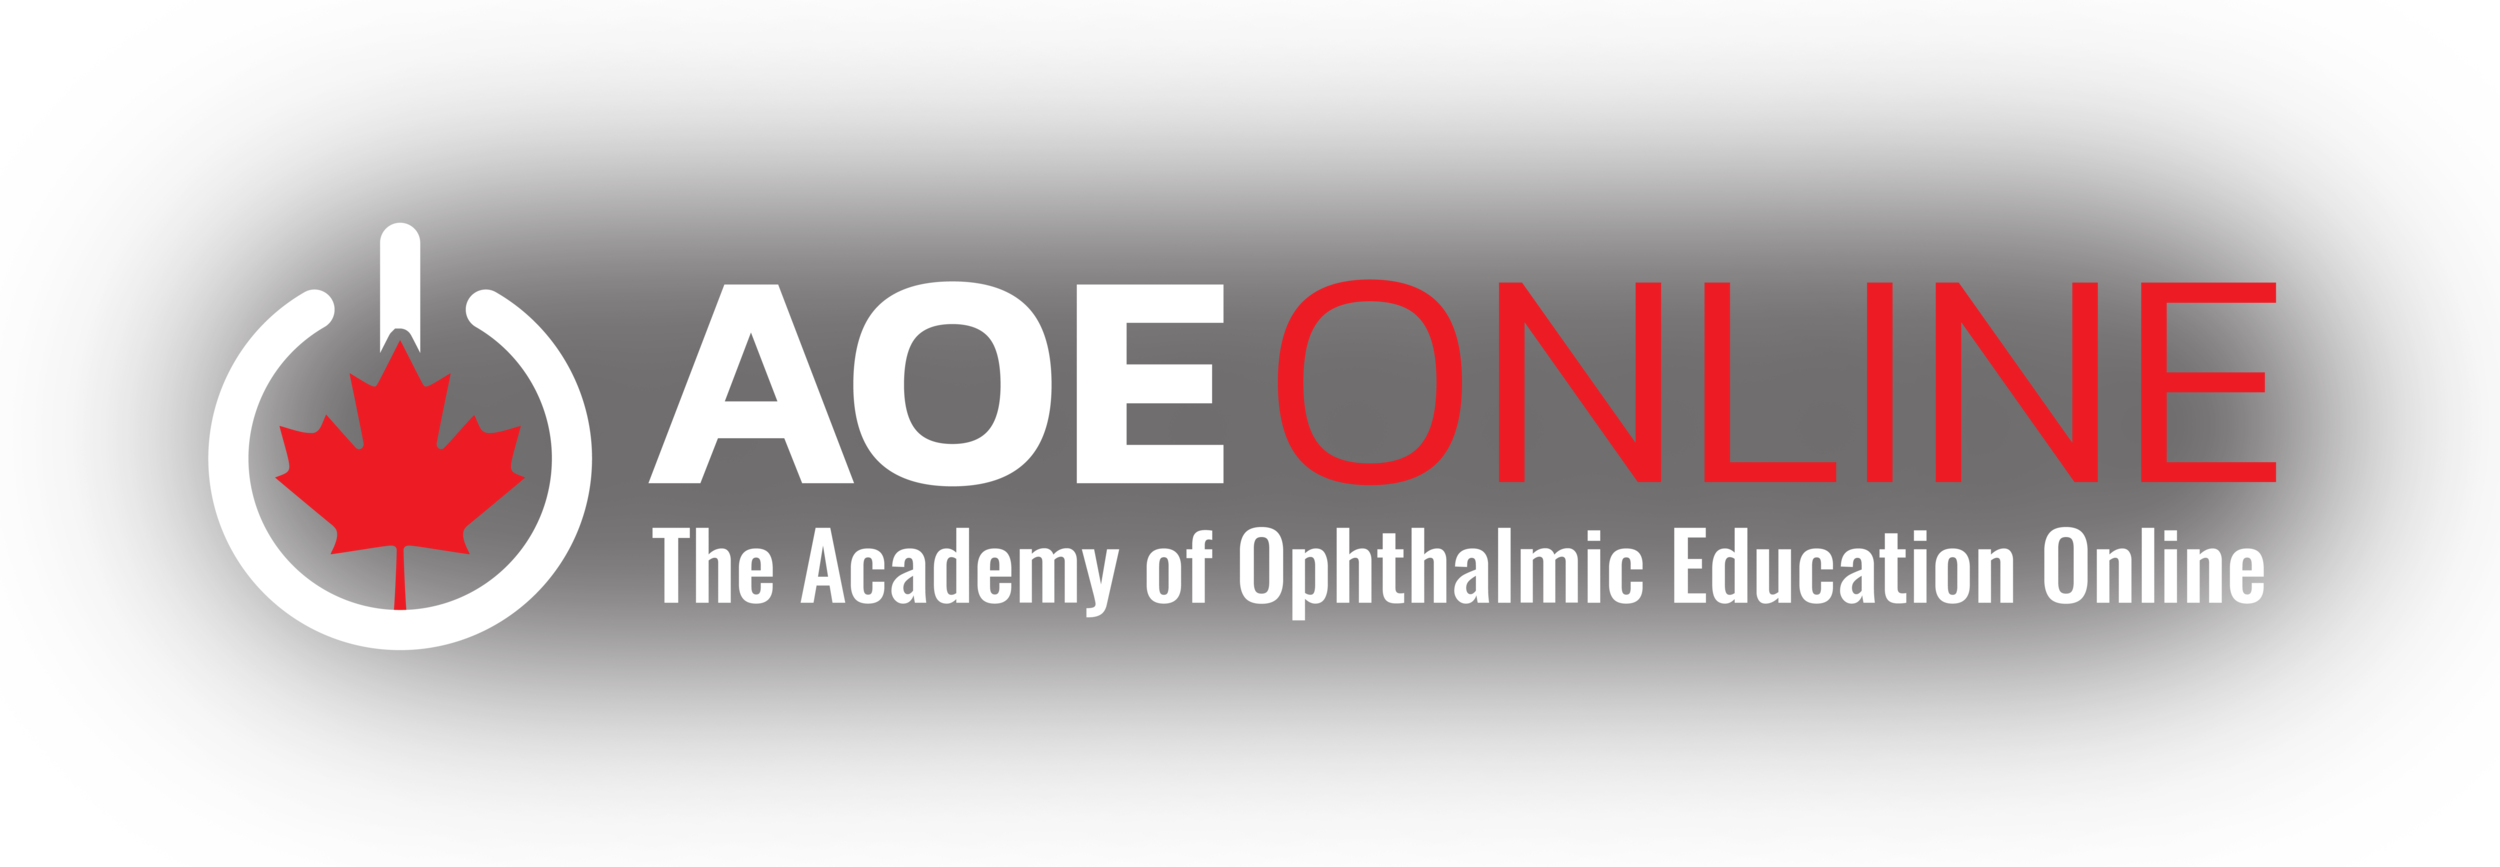 AOE Online